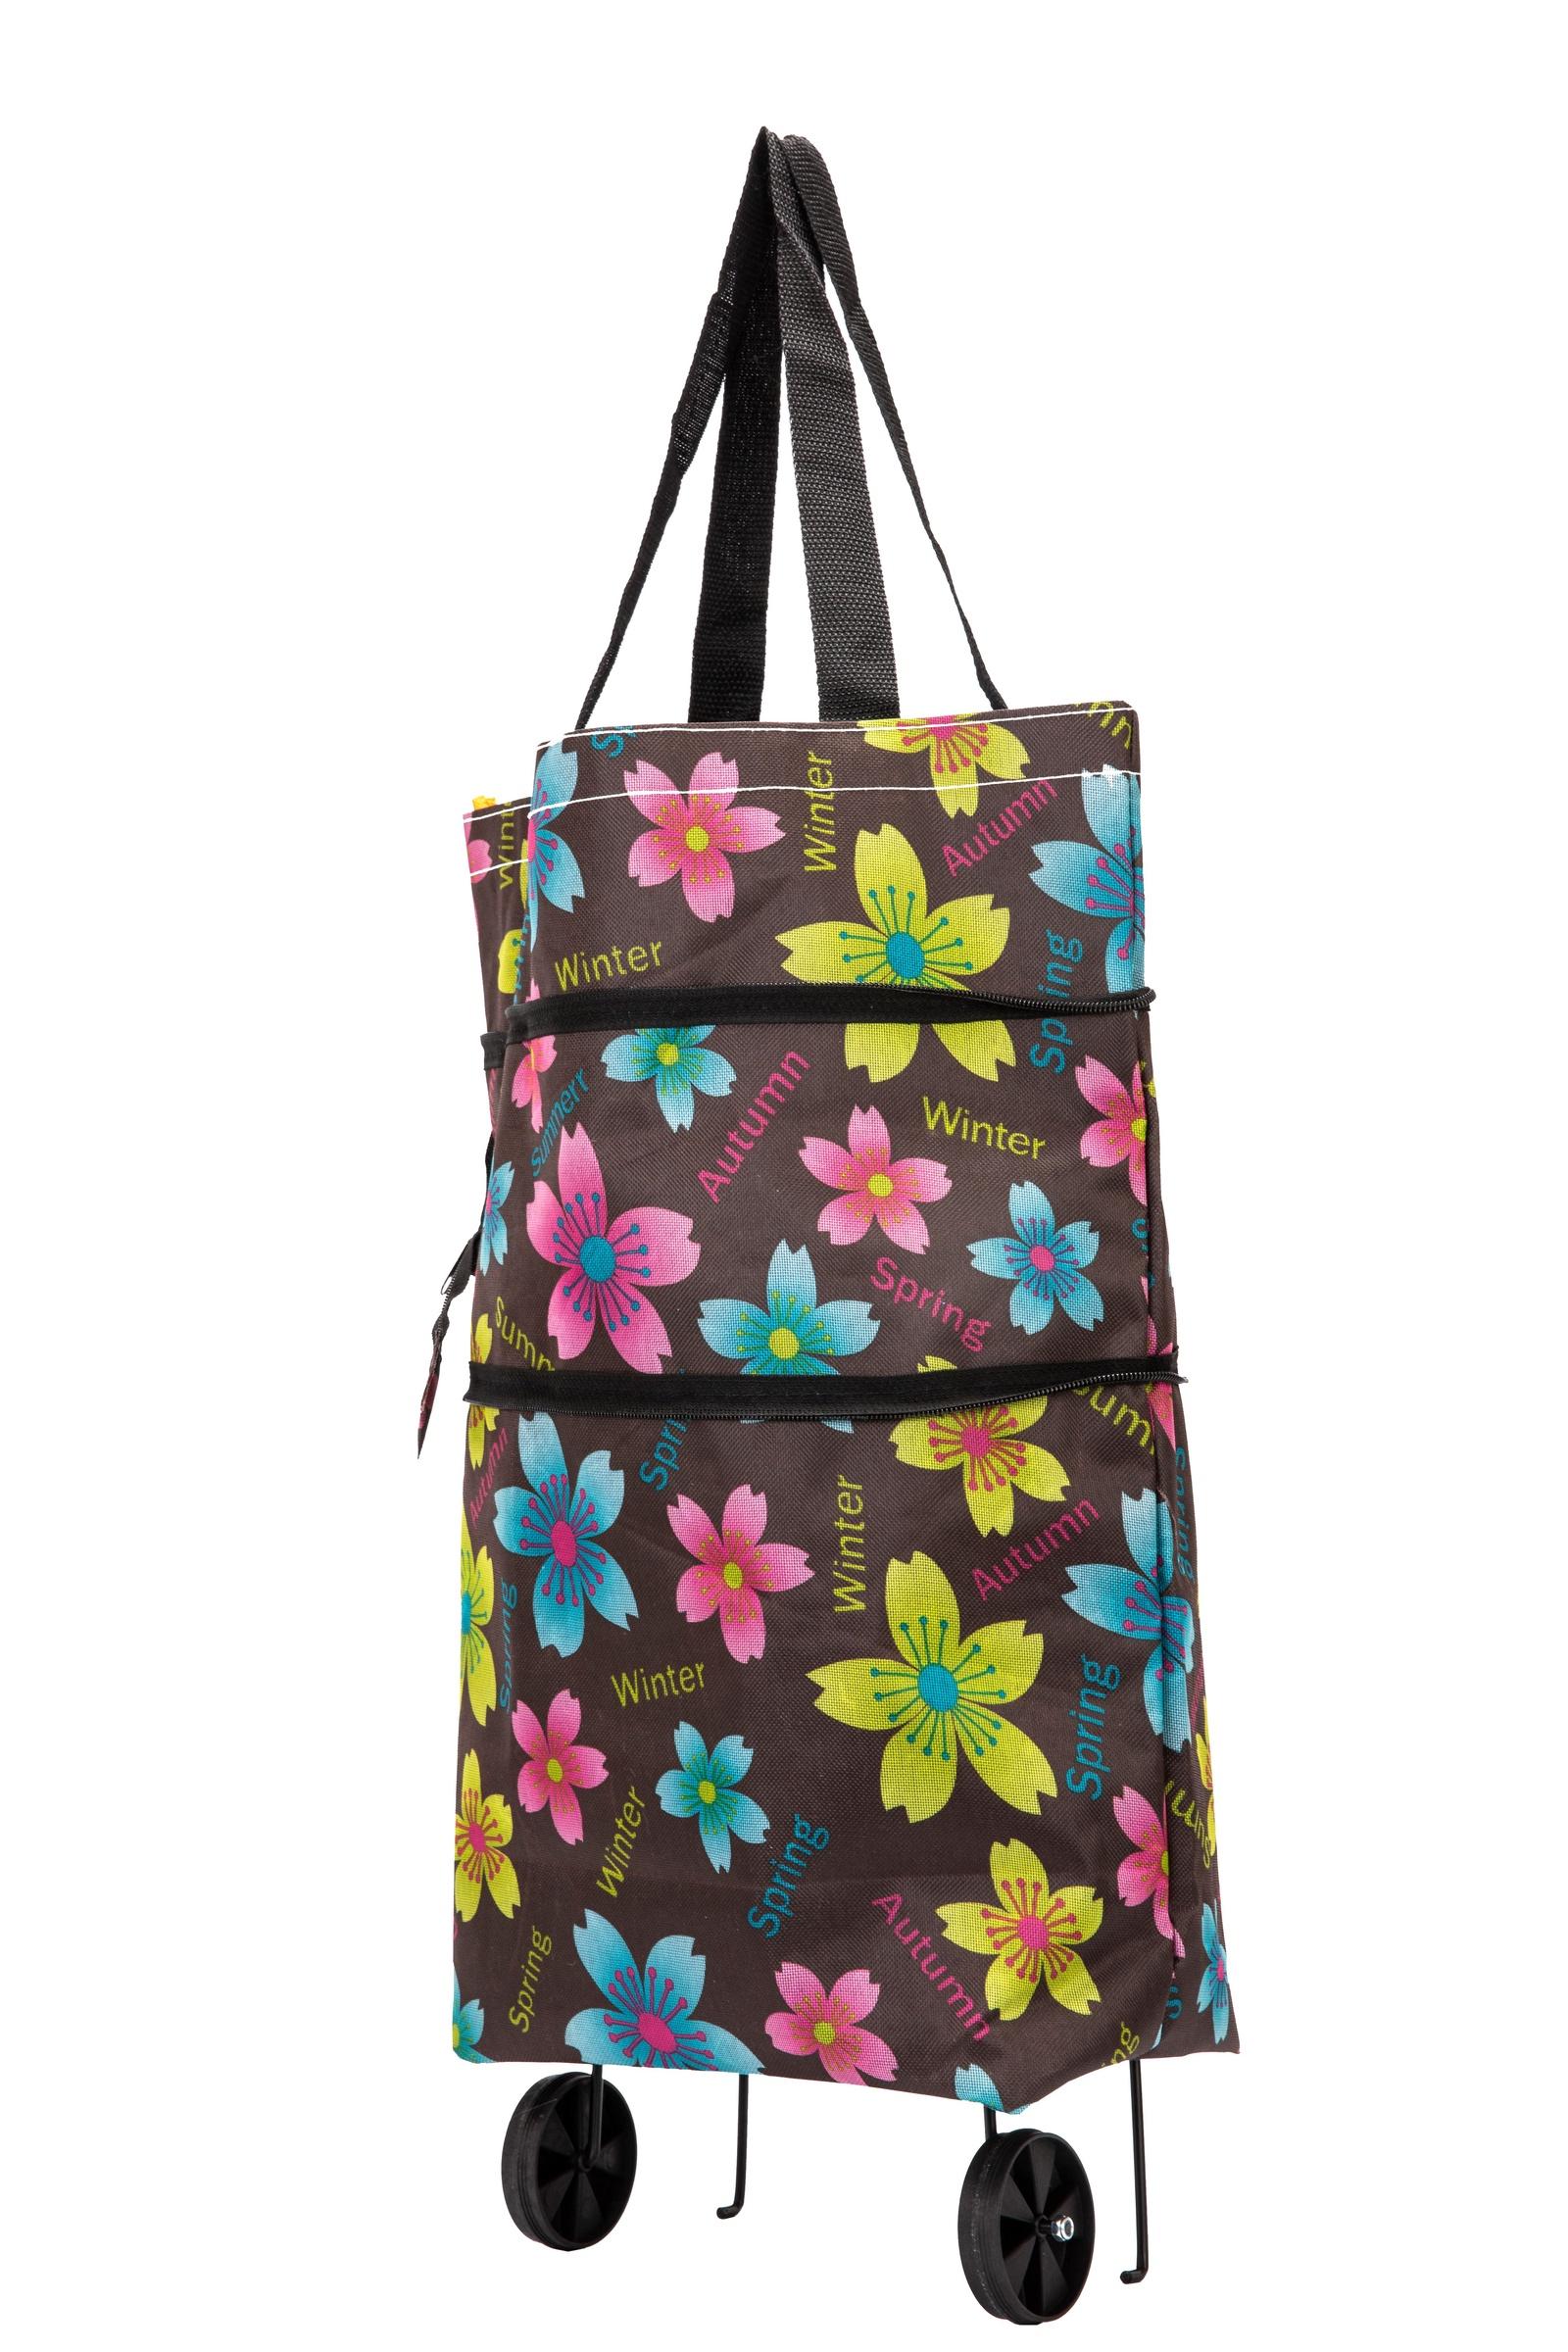 Сумка хозяйственная Bradex сумка хозяйственная shopping bag цвет голубой